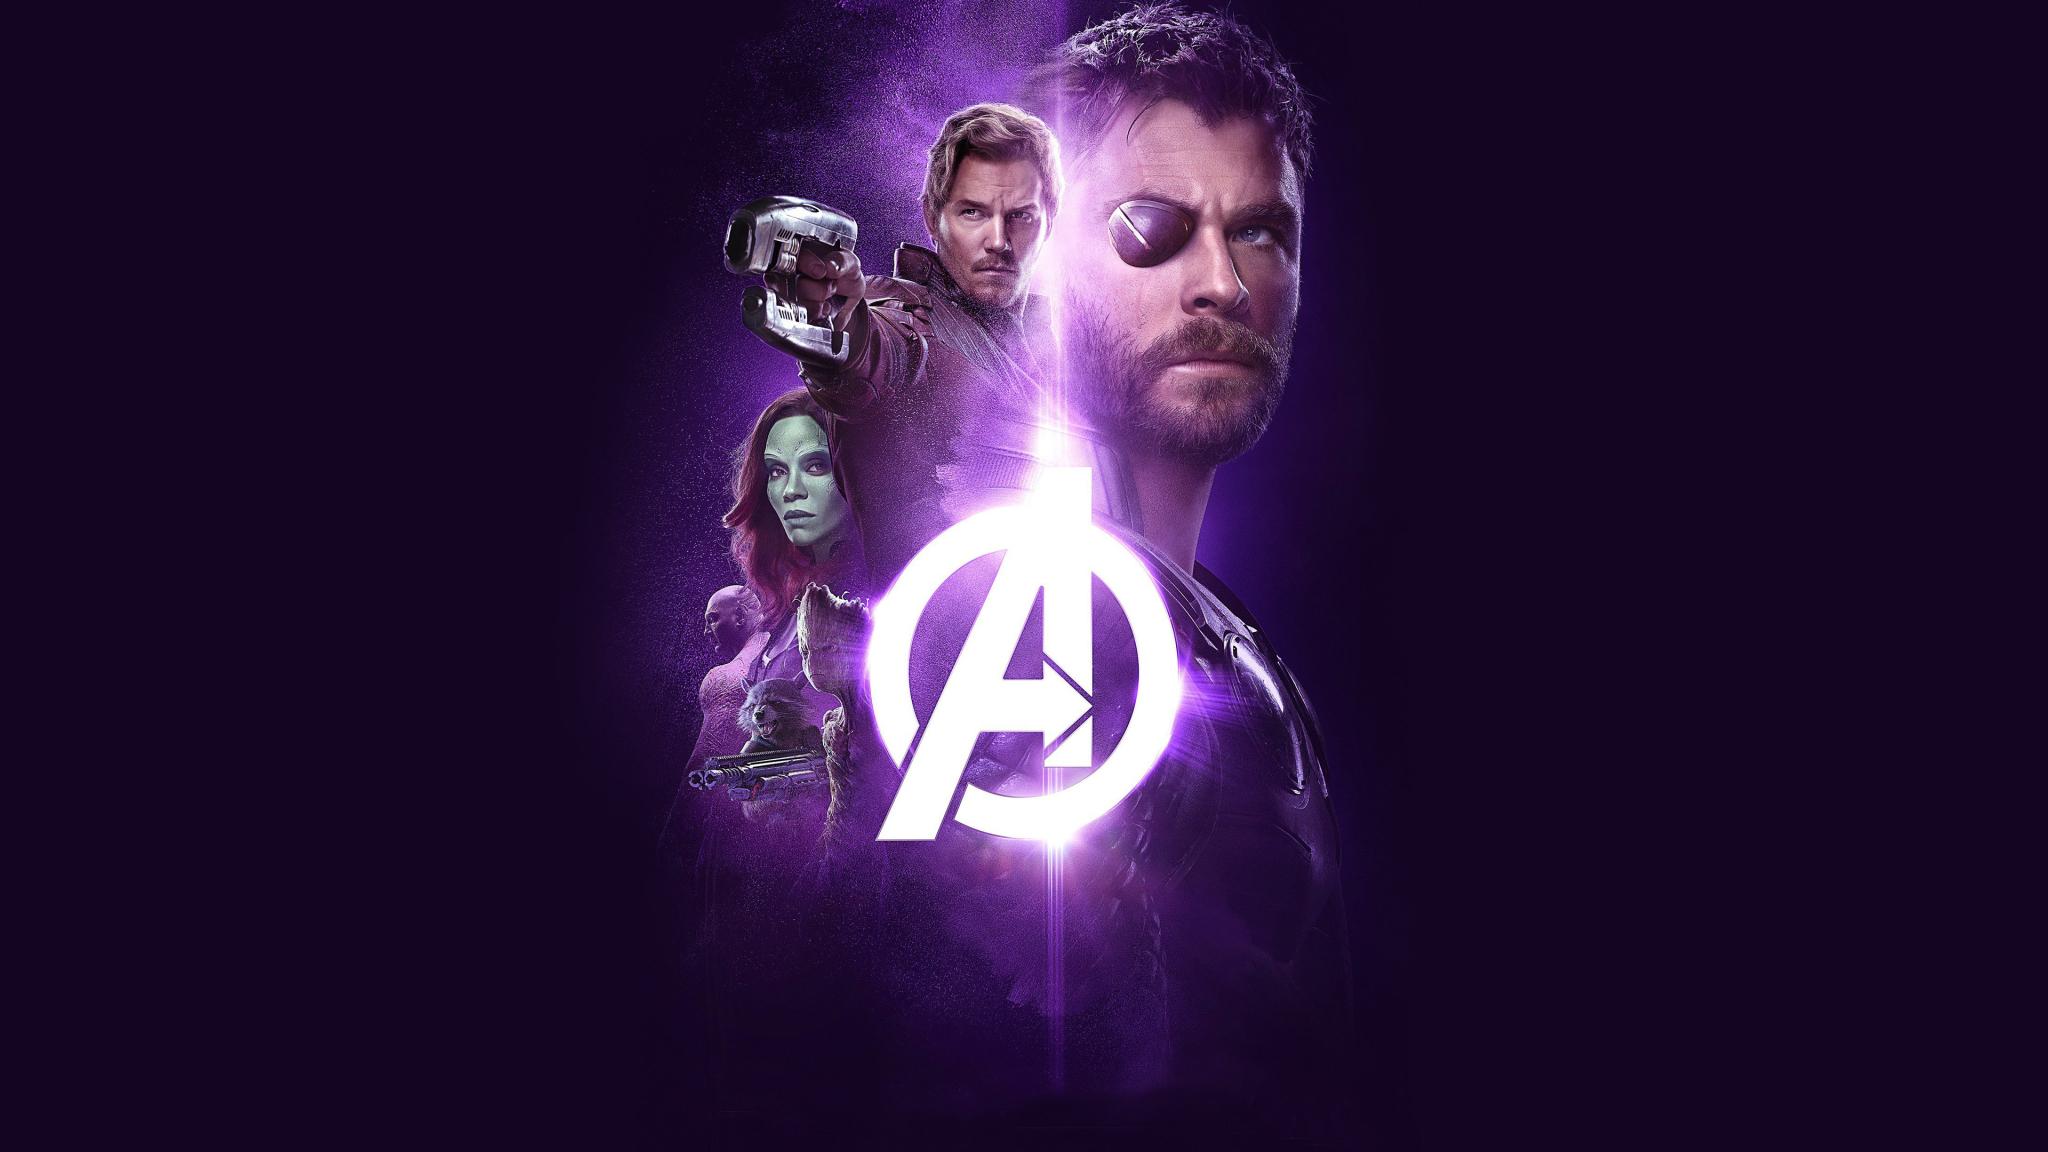 Avengers Infinity War 2018 Thanos 4k Uhd 3 2 3840x2560: Avengers Infinity War 2018 Power Stone Poster, HD 4K Wallpaper